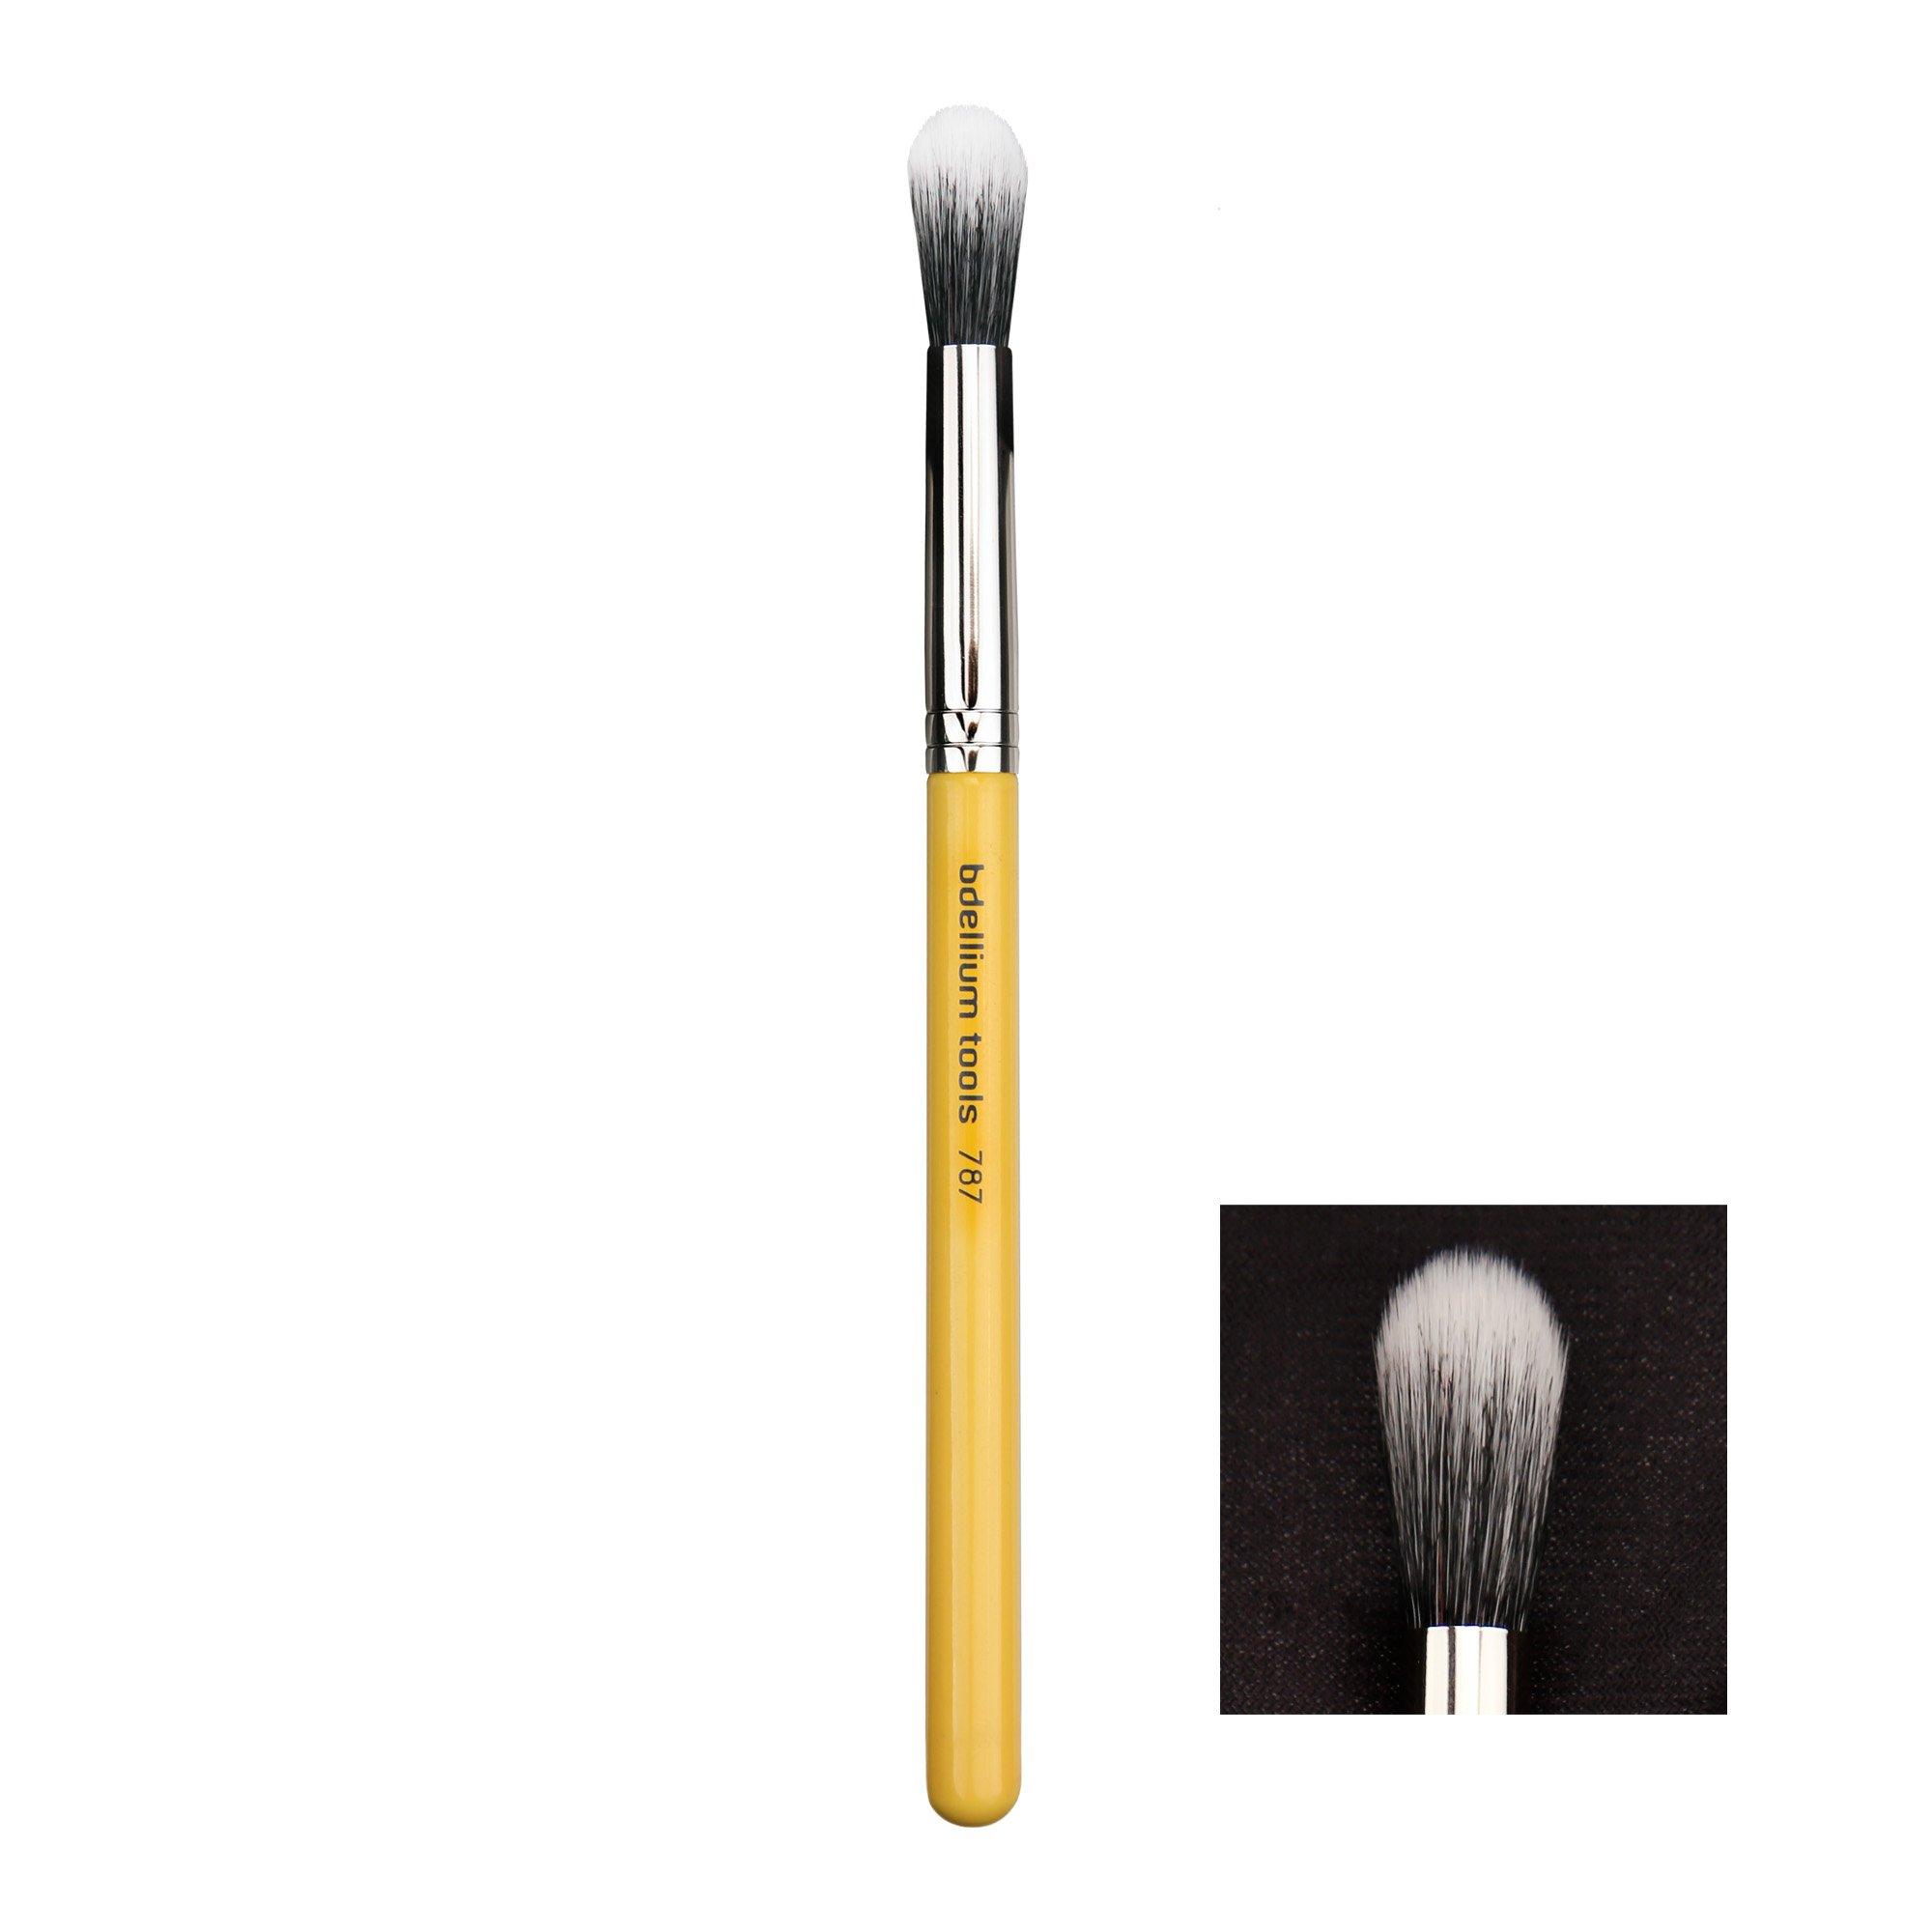 Bdellium Tools Studio Line DF Large Tapered Blending Brush, Yellow